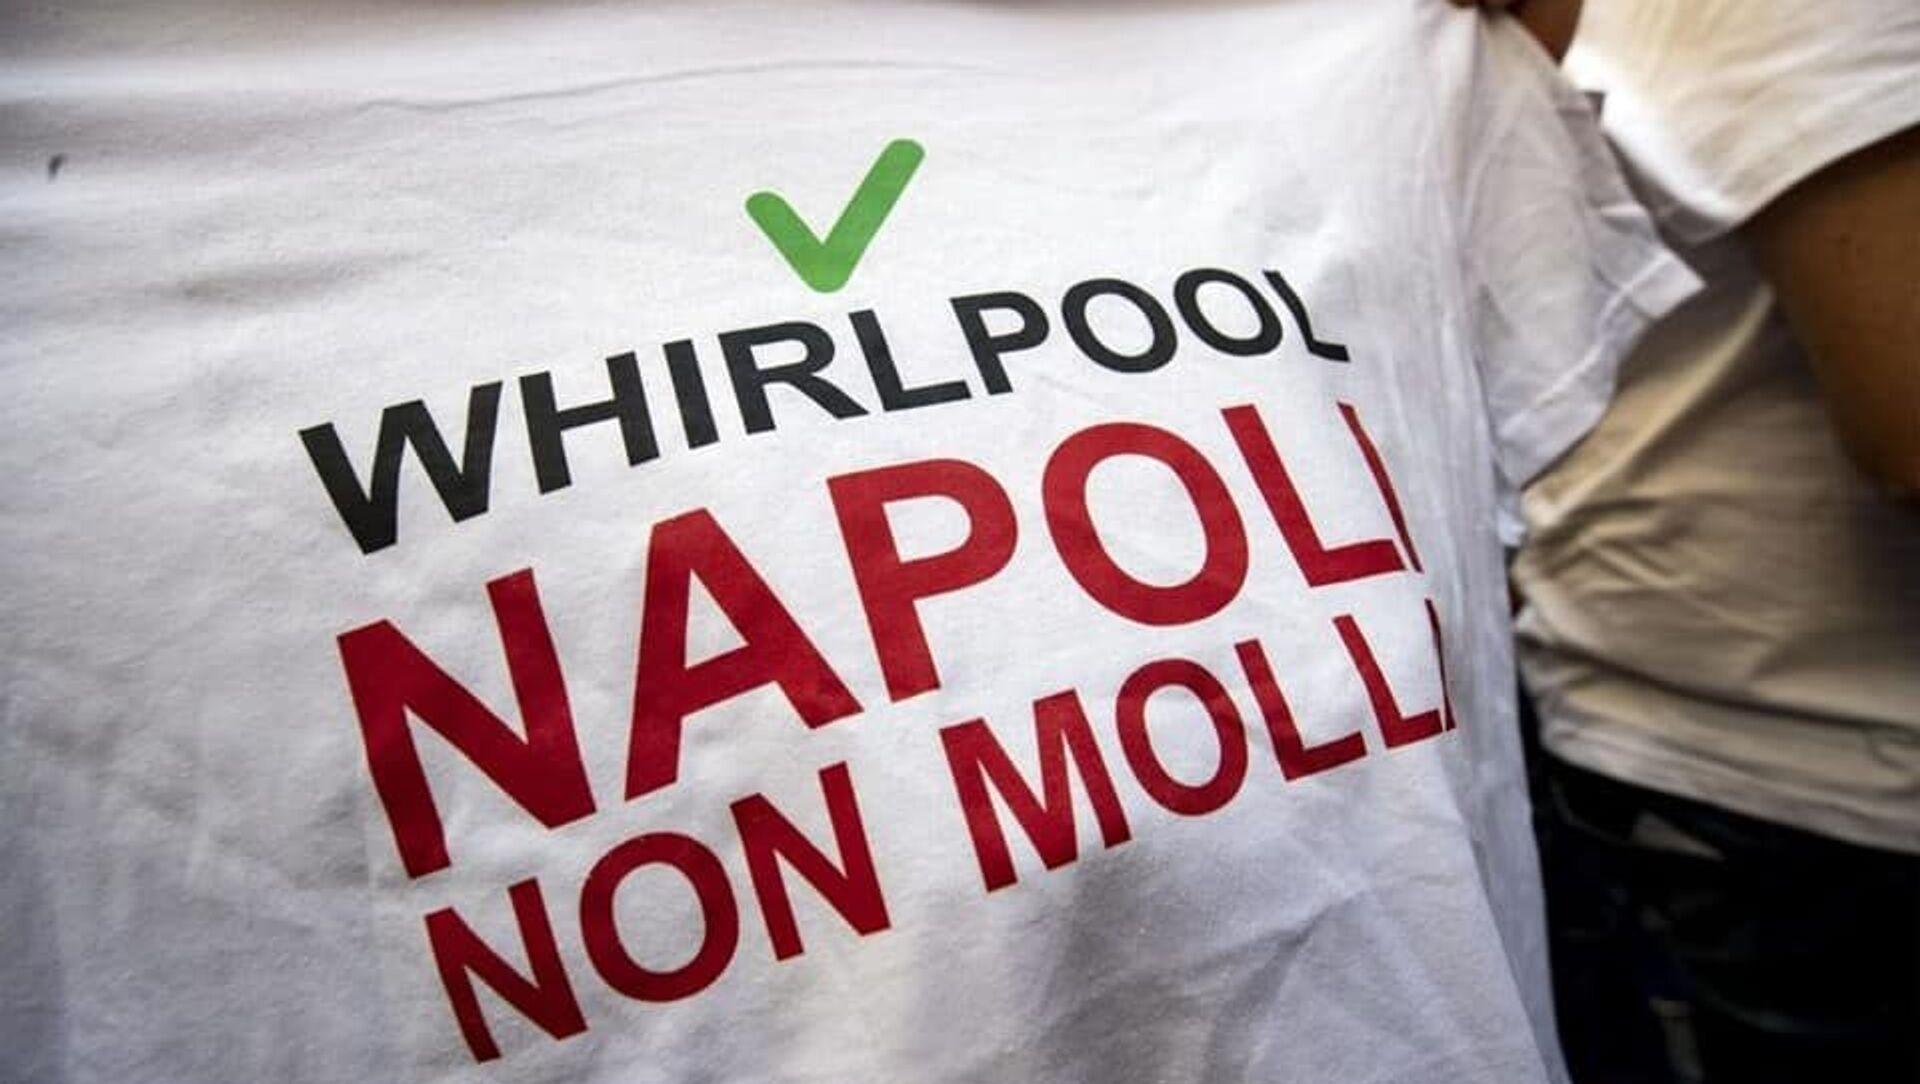 Vertenza Whirlpool, la protesta dei lavoratori - Sputnik Italia, 1920, 18.02.2021